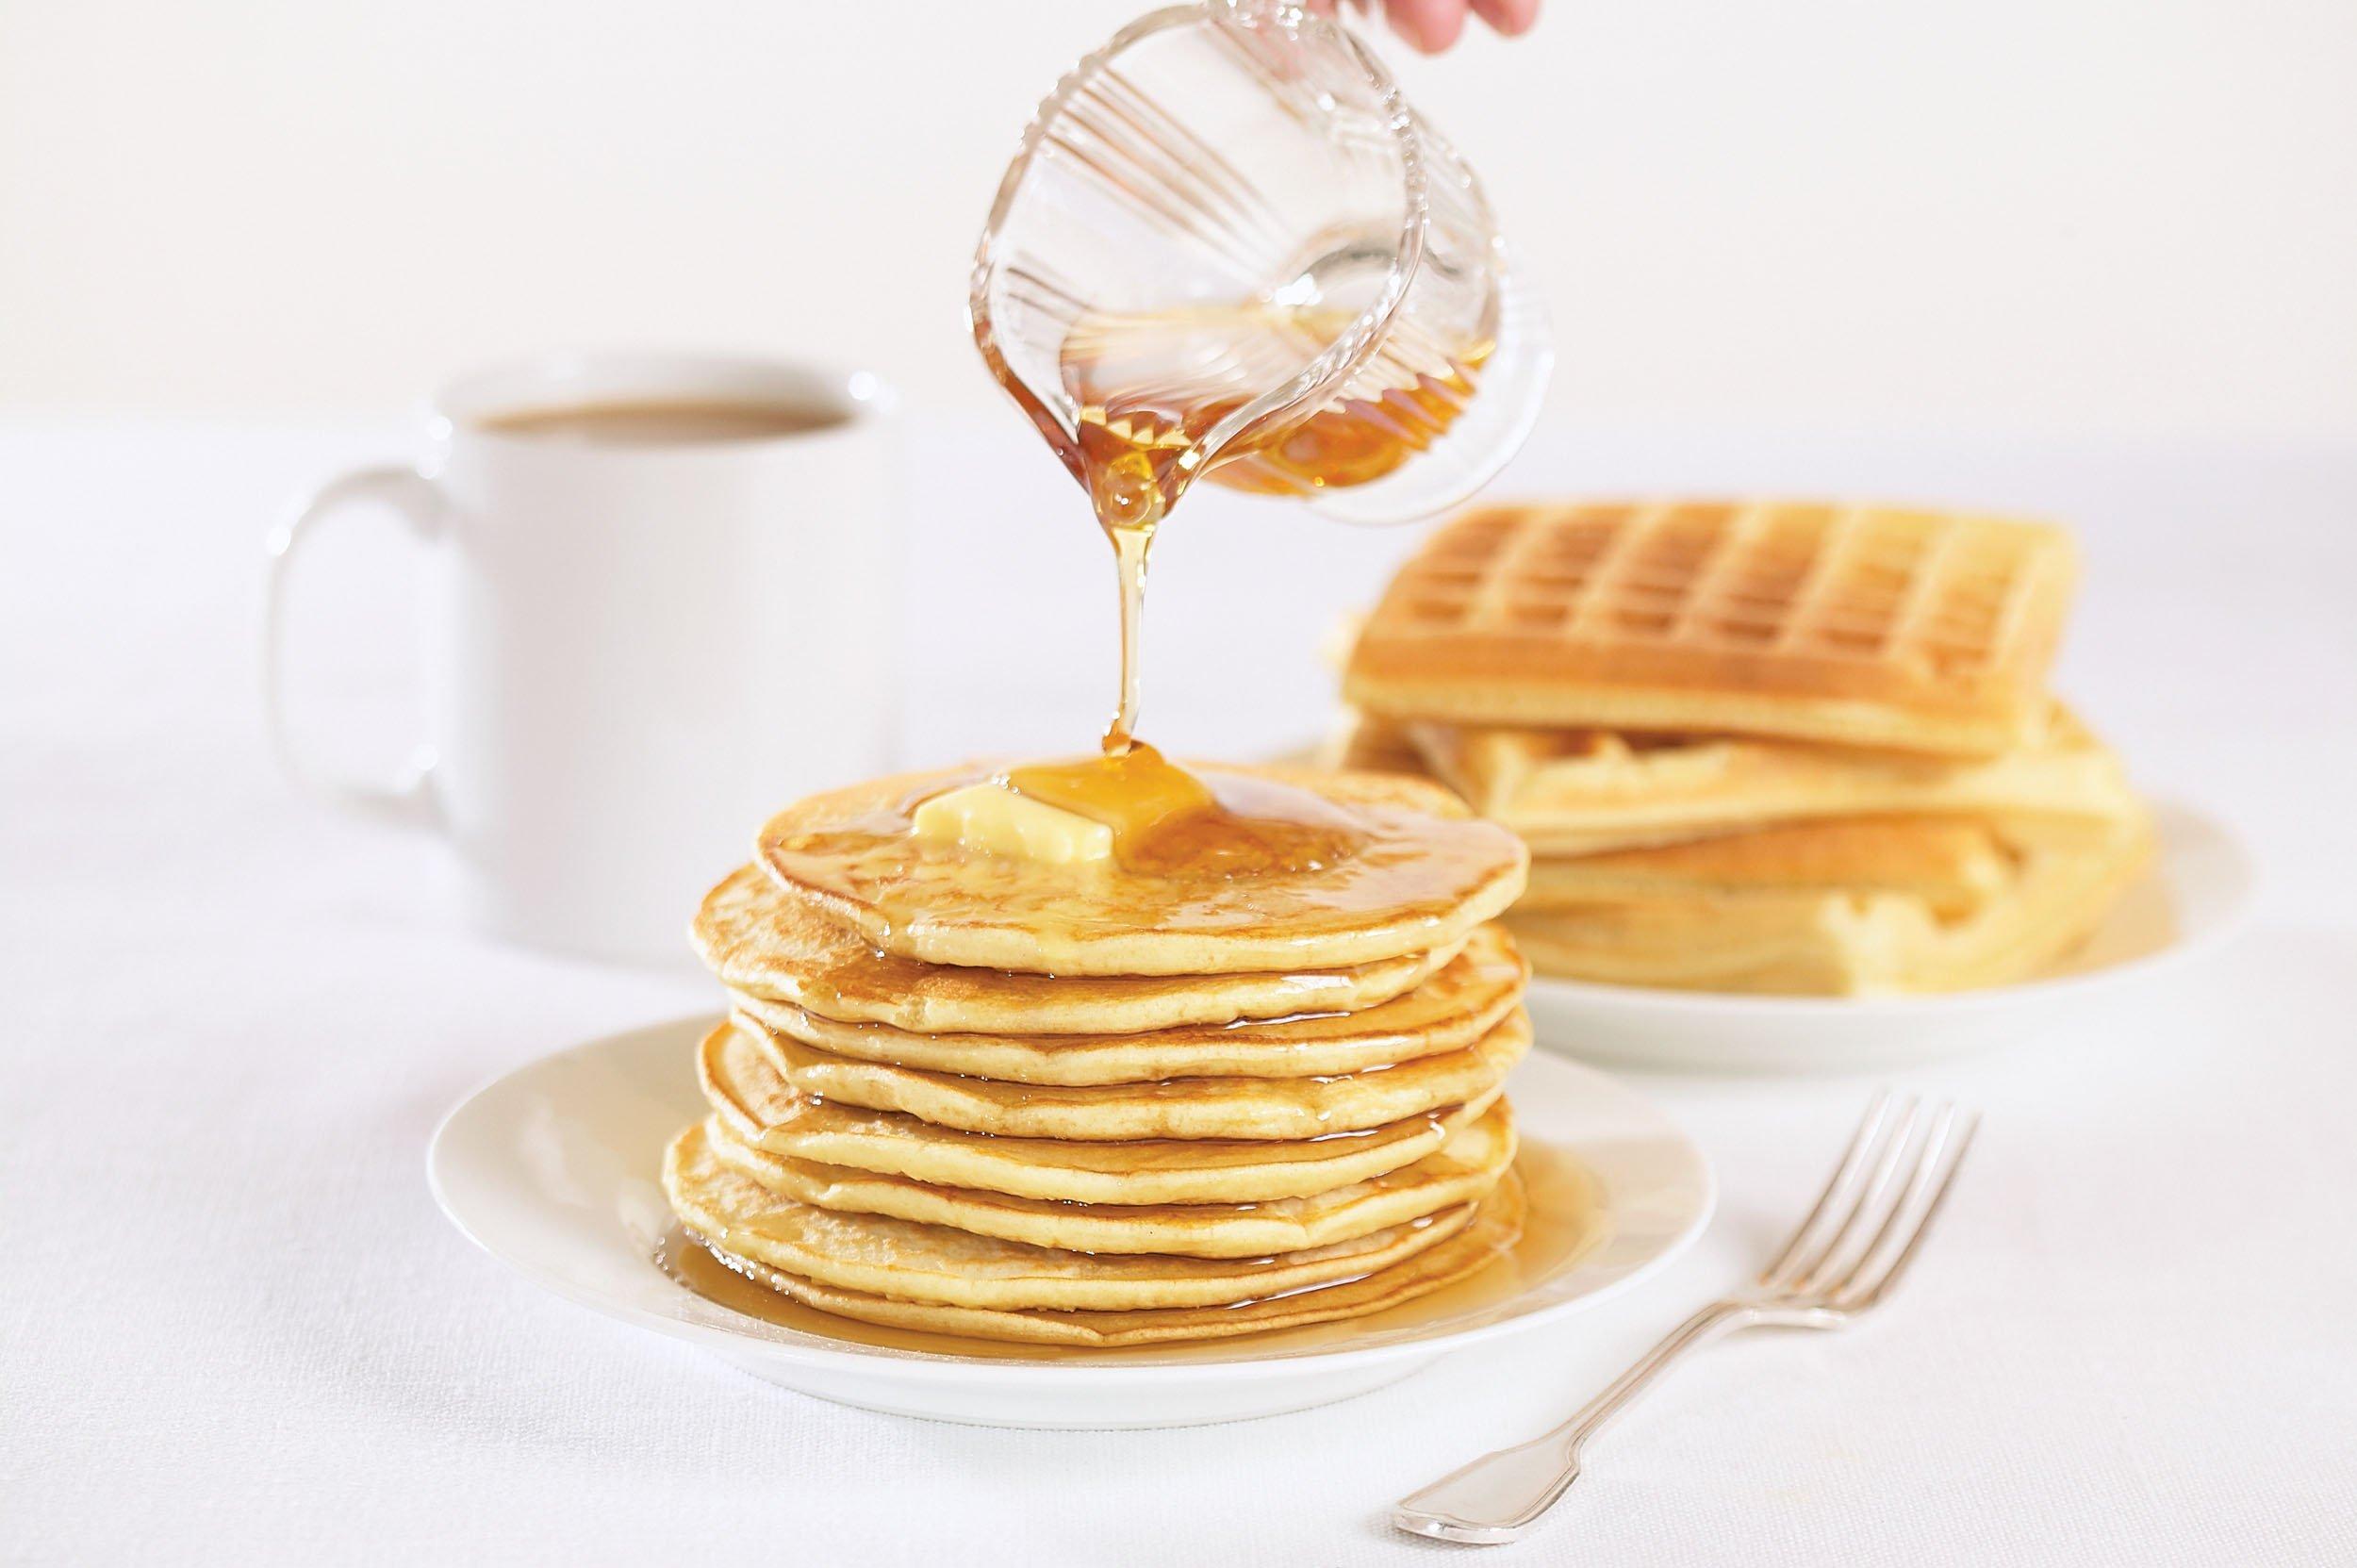 Stonewall Kitchen Farmhouse Pancake & Waffle Mix, 33 oz by Stonewall Kitchen (Image #5)